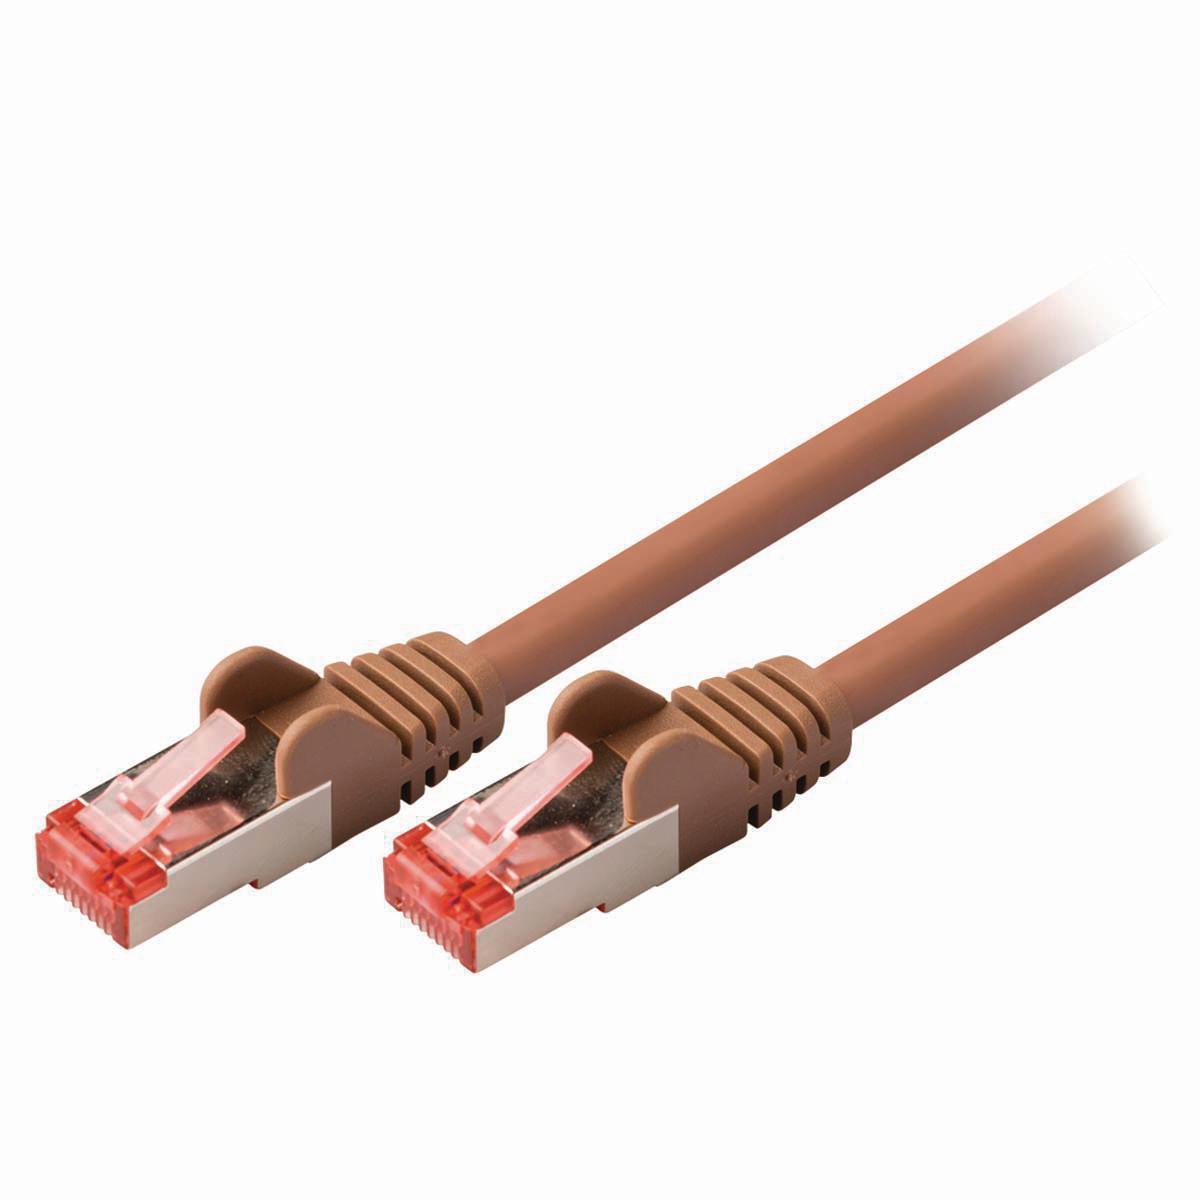 Nedis Cat 6 S/FTP Network Cable   RJ45 Male - RJ45 Male   10 m   Brown